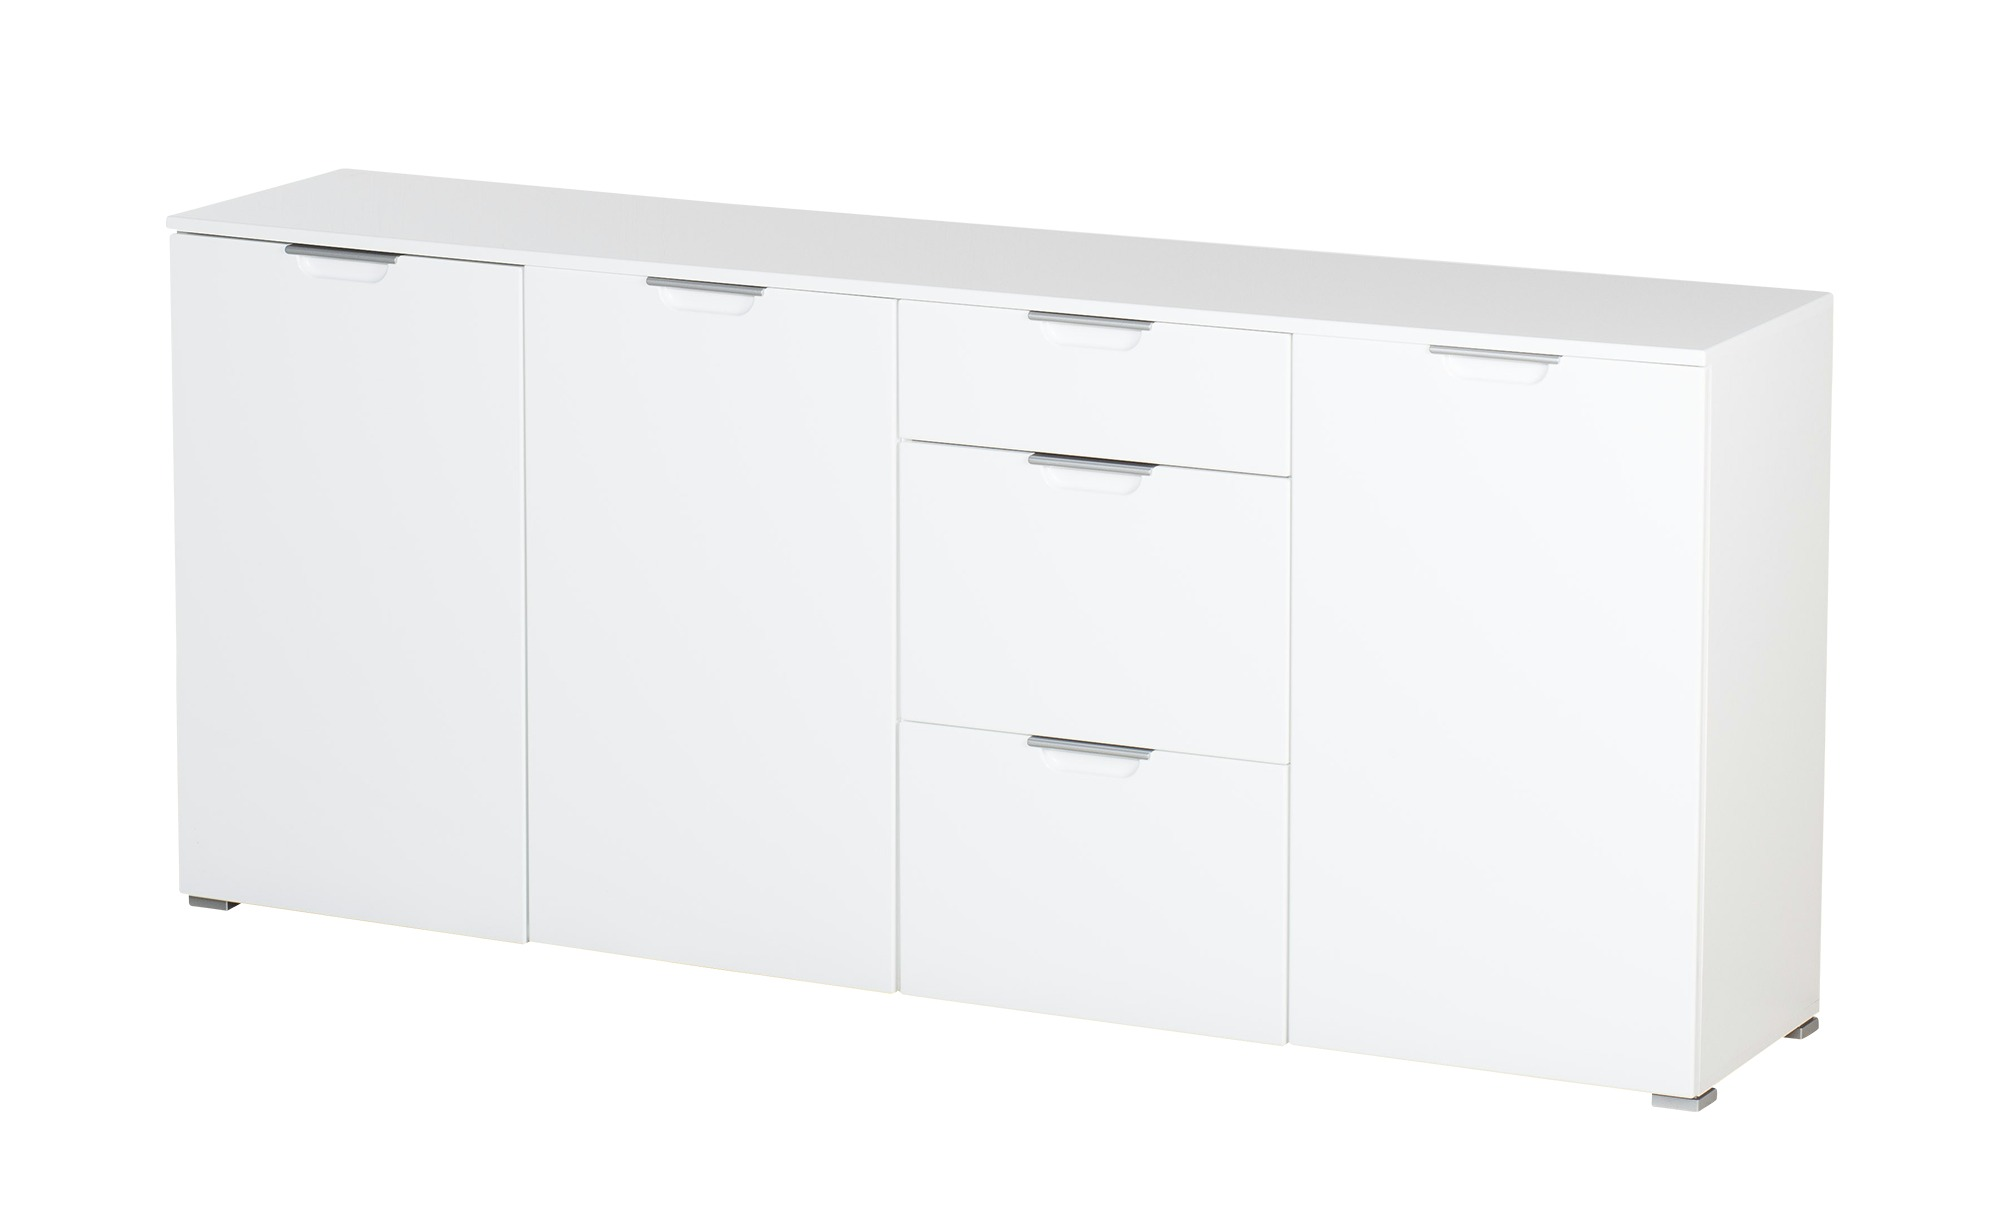 uno Sideboard  PORTER ¦ weiß ¦ Maße (cm): B: 192 H: 85 T: 40 Kommoden & Sideboards > Kommoden - Höffner